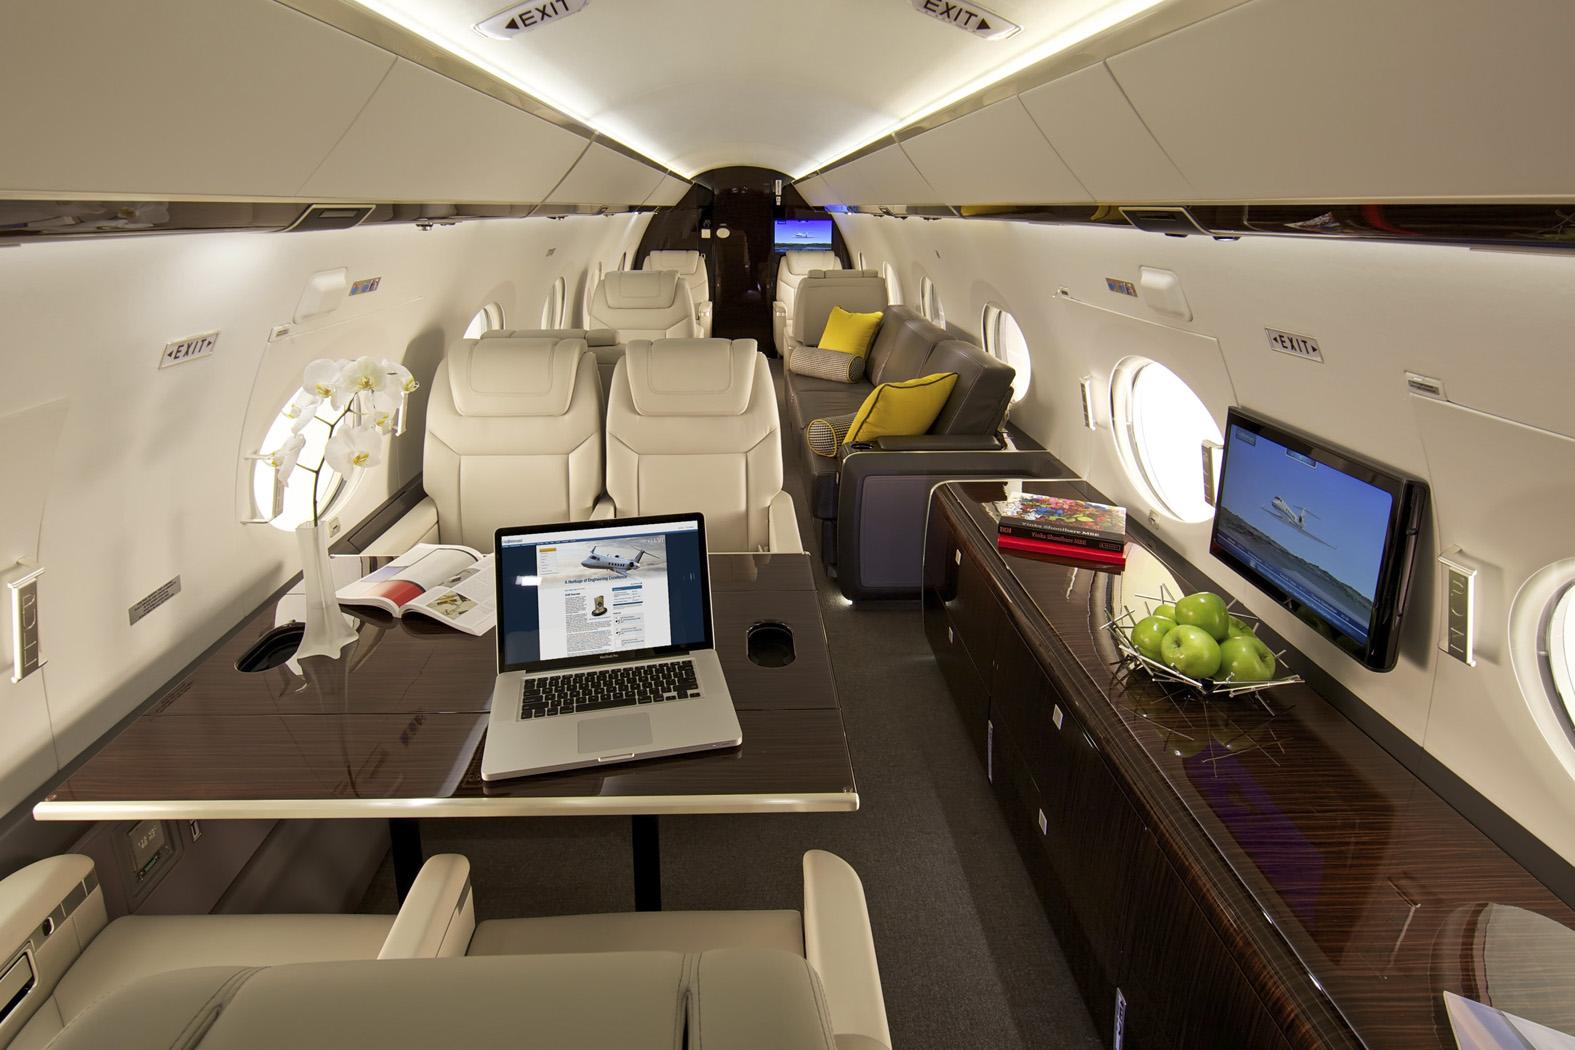 Салон реактивного самолёта Gulfstream G550